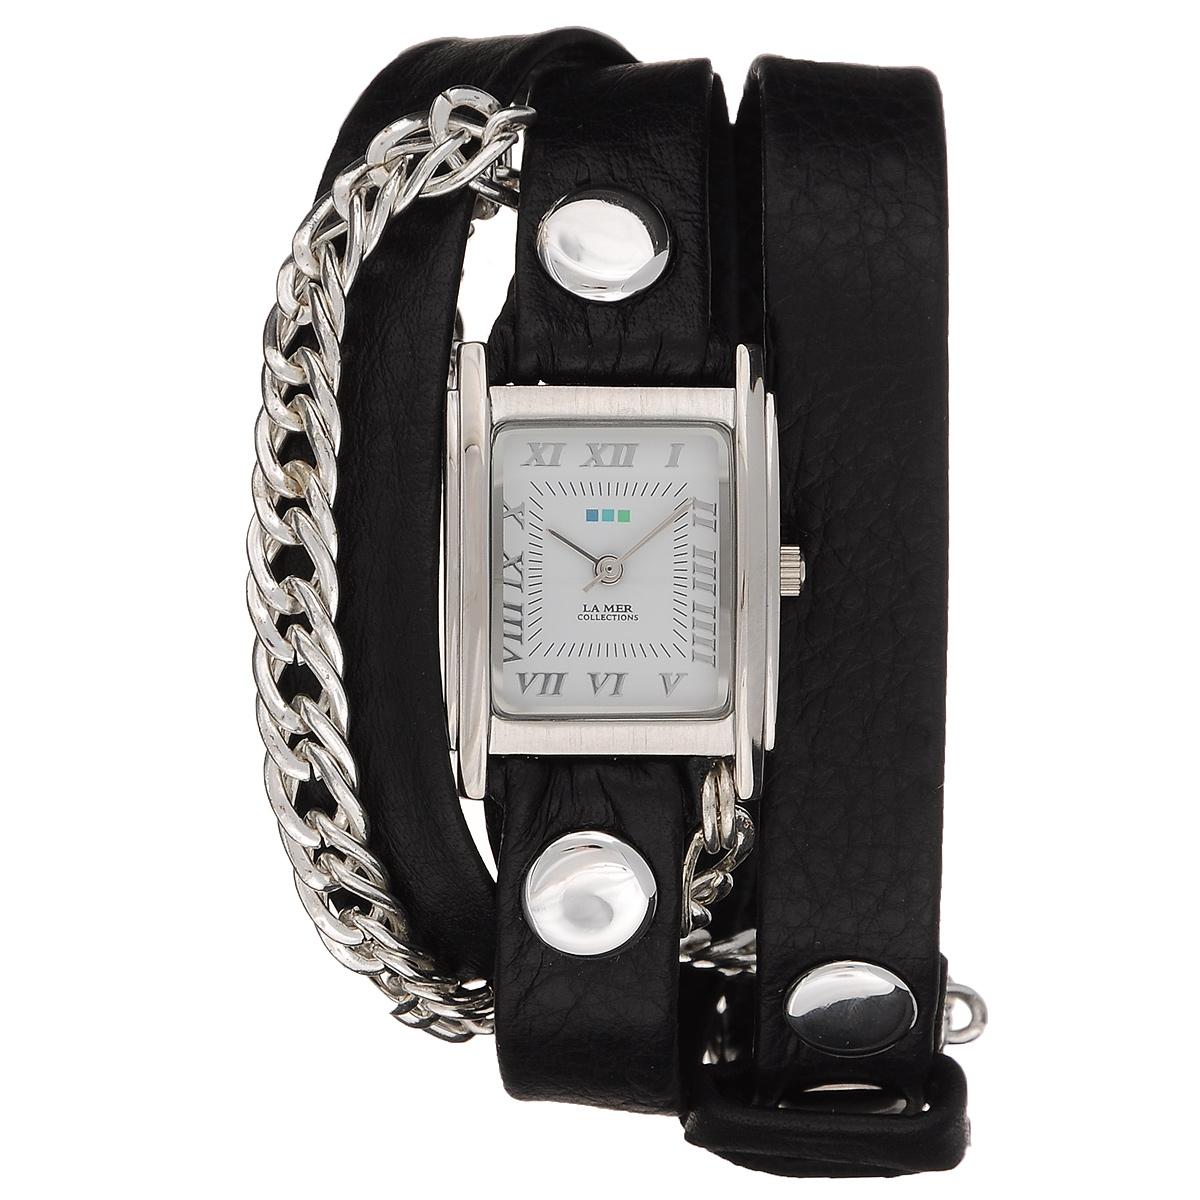 "Часы наручные женские La Mer Collections ""Chain Glam Silver Black"". LMSCW1003x ( LMSCW1003x )"